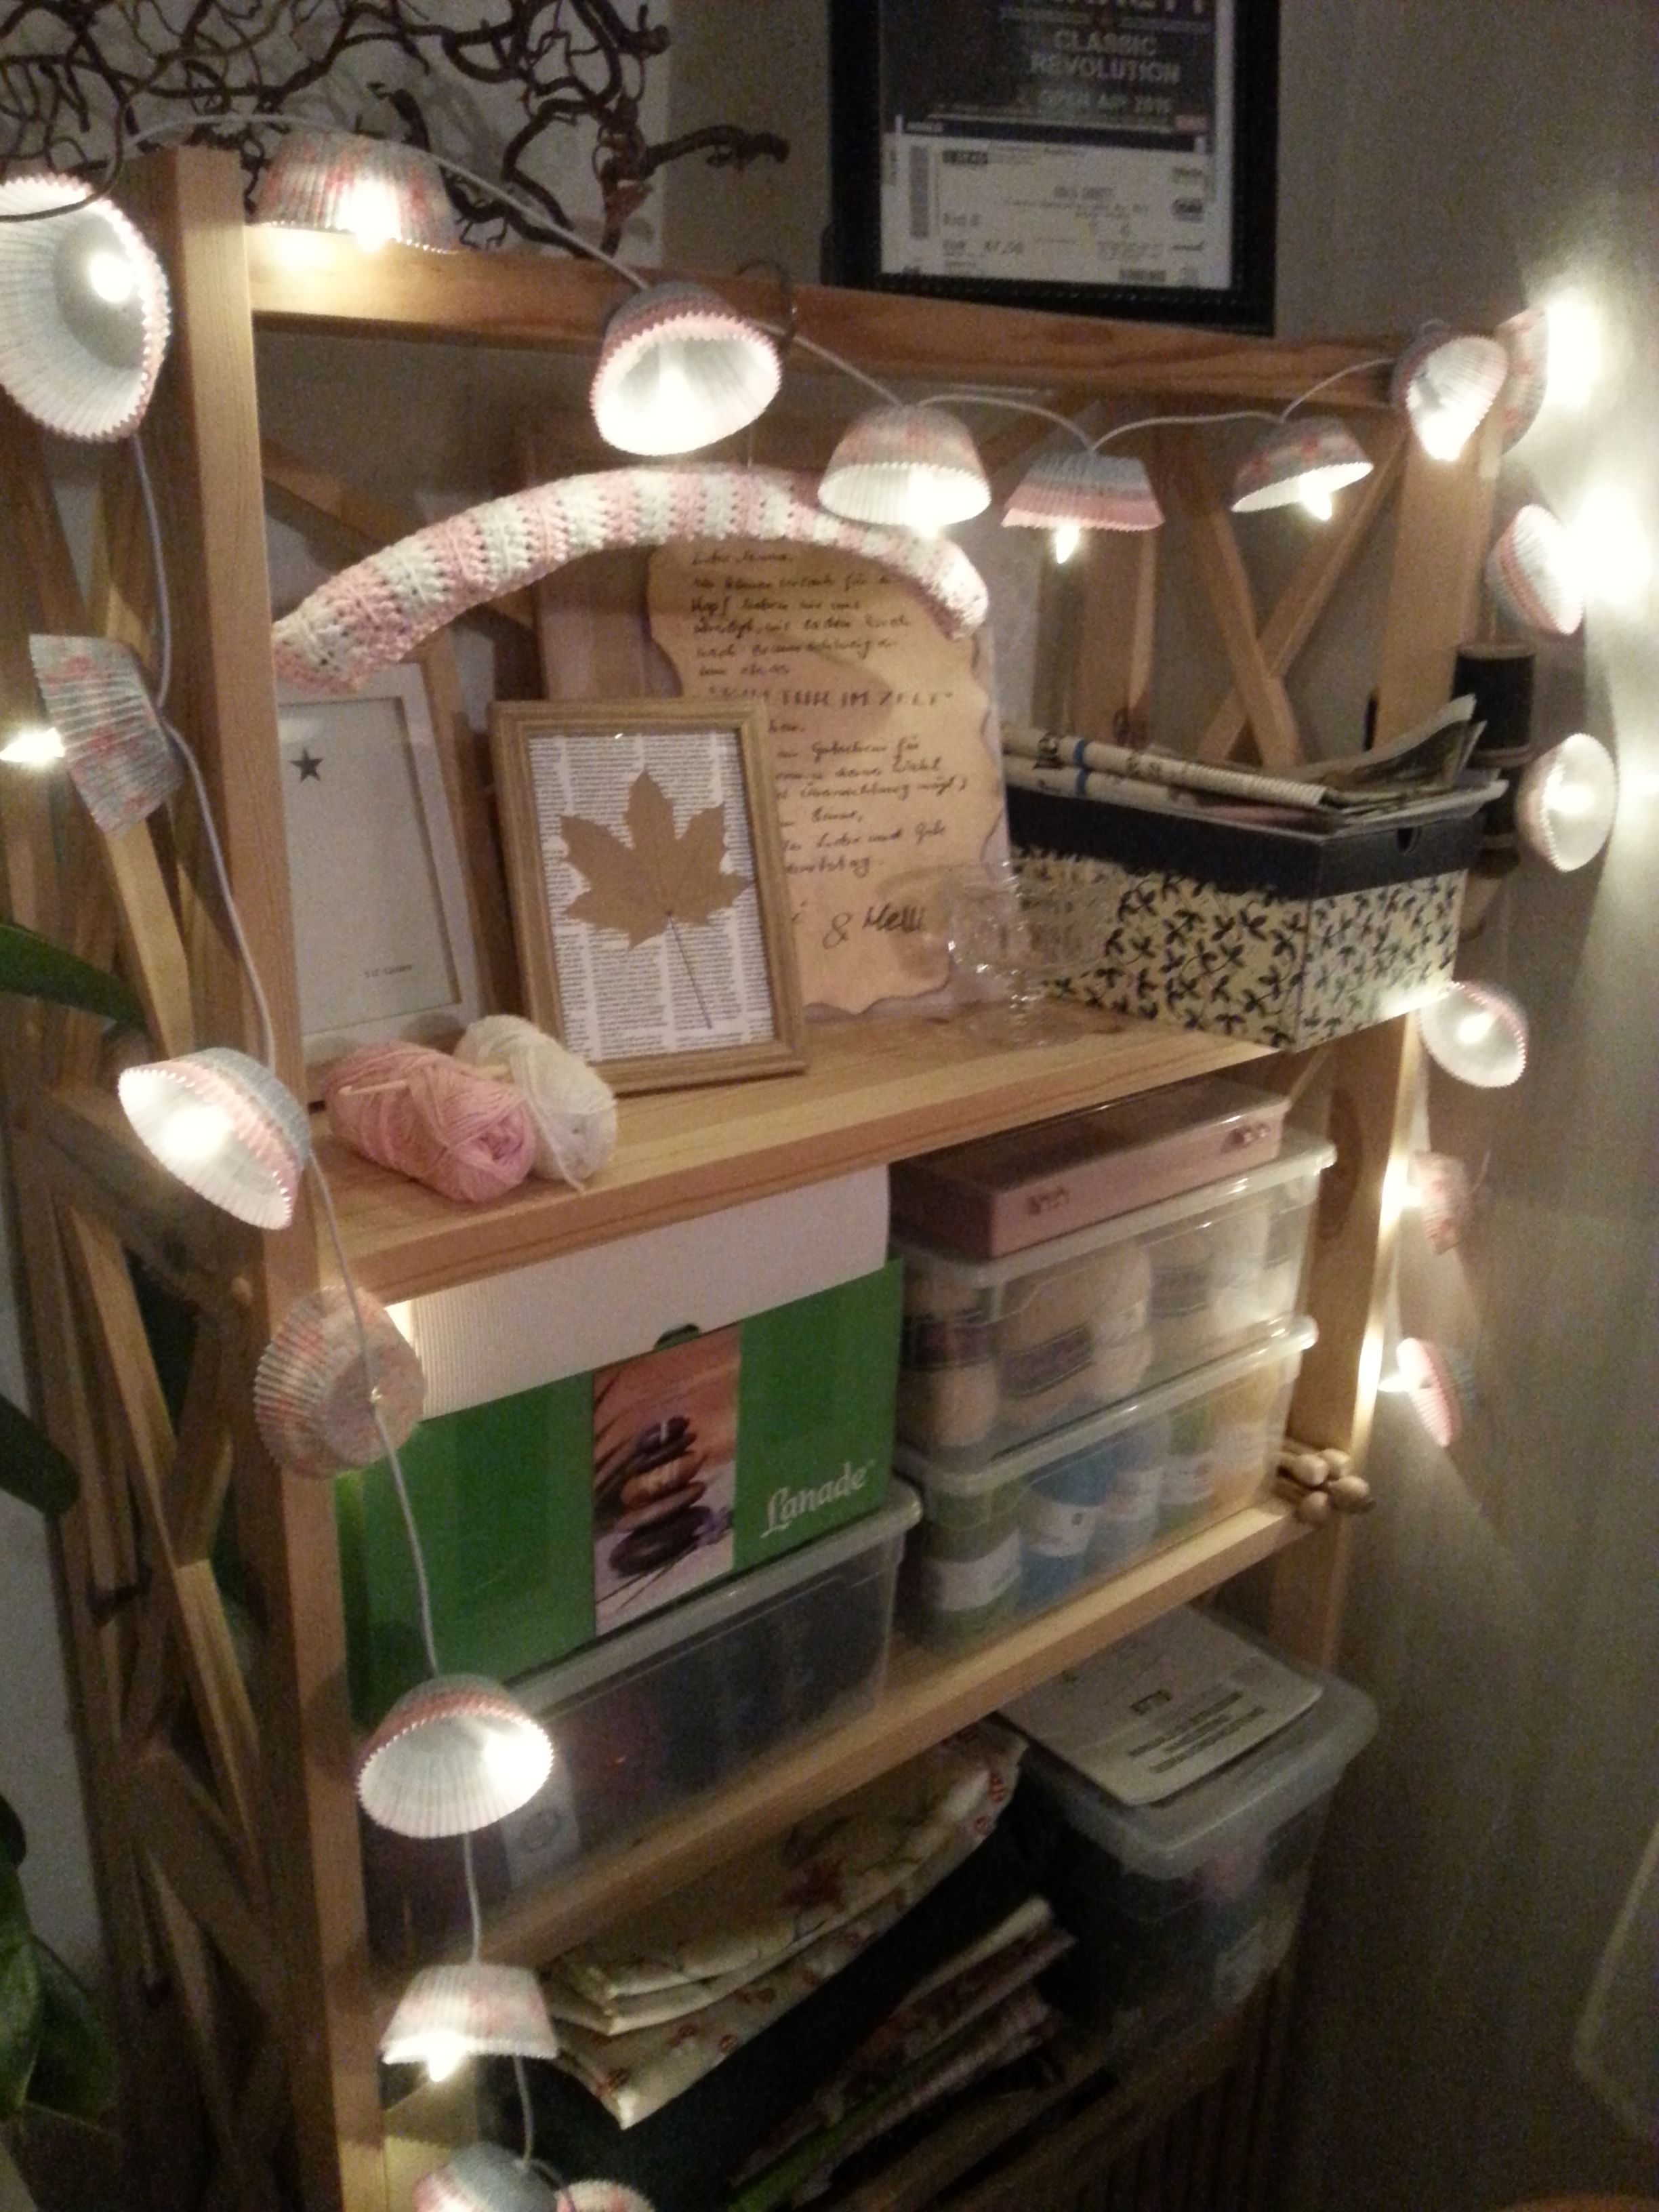 die besten 25 led kette ideen auf pinterest led licht bars led leiste k che und led lampe. Black Bedroom Furniture Sets. Home Design Ideas